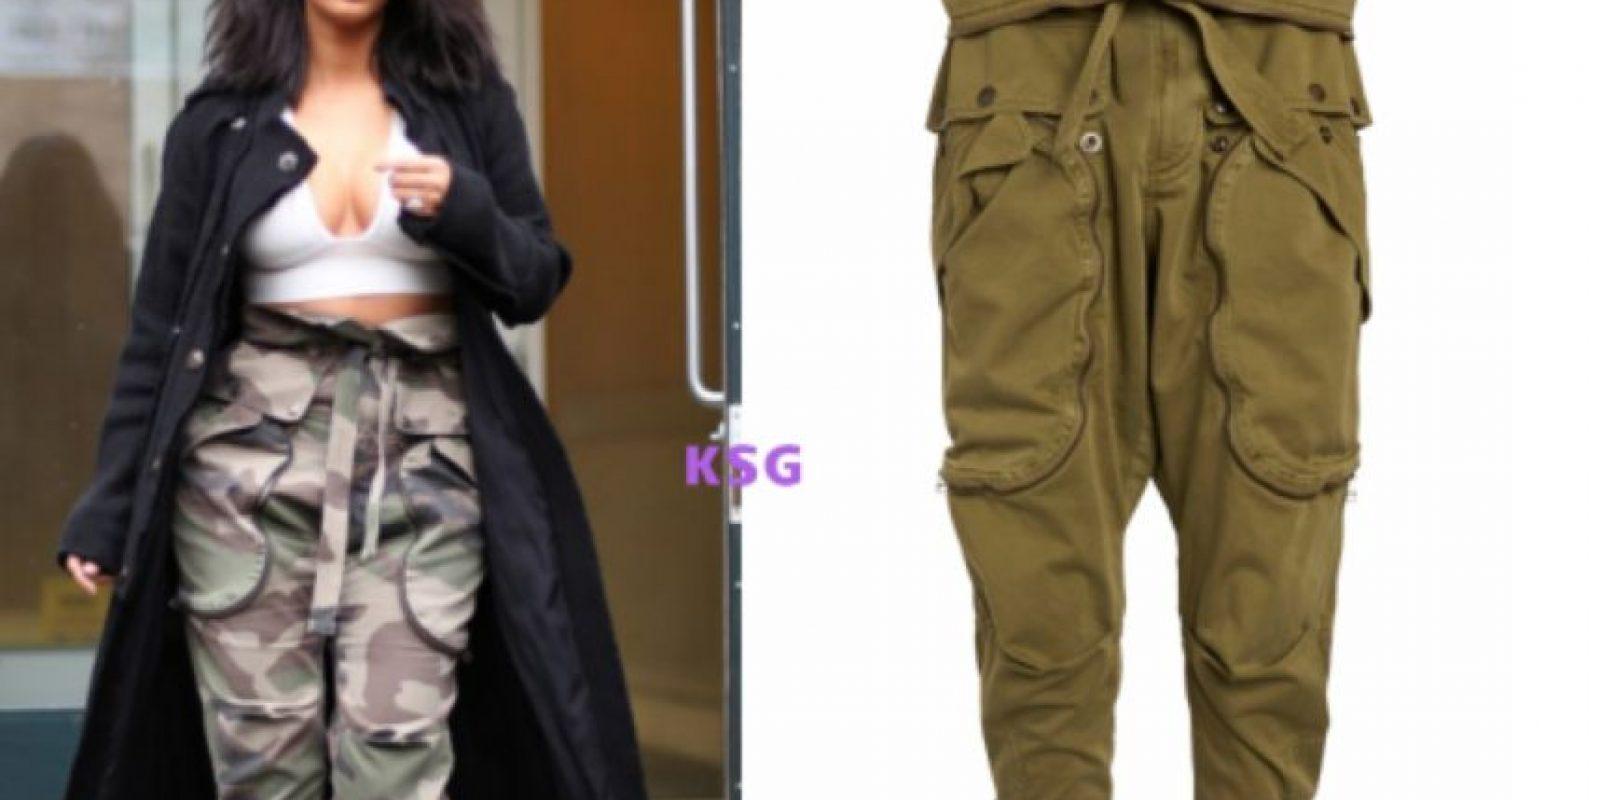 Pantalones cargo de Faith Connection. ¿Ya ven por qué esta moda no sobrevivió más allá de 2002? Foto:KimStyleGuide/Tumblr